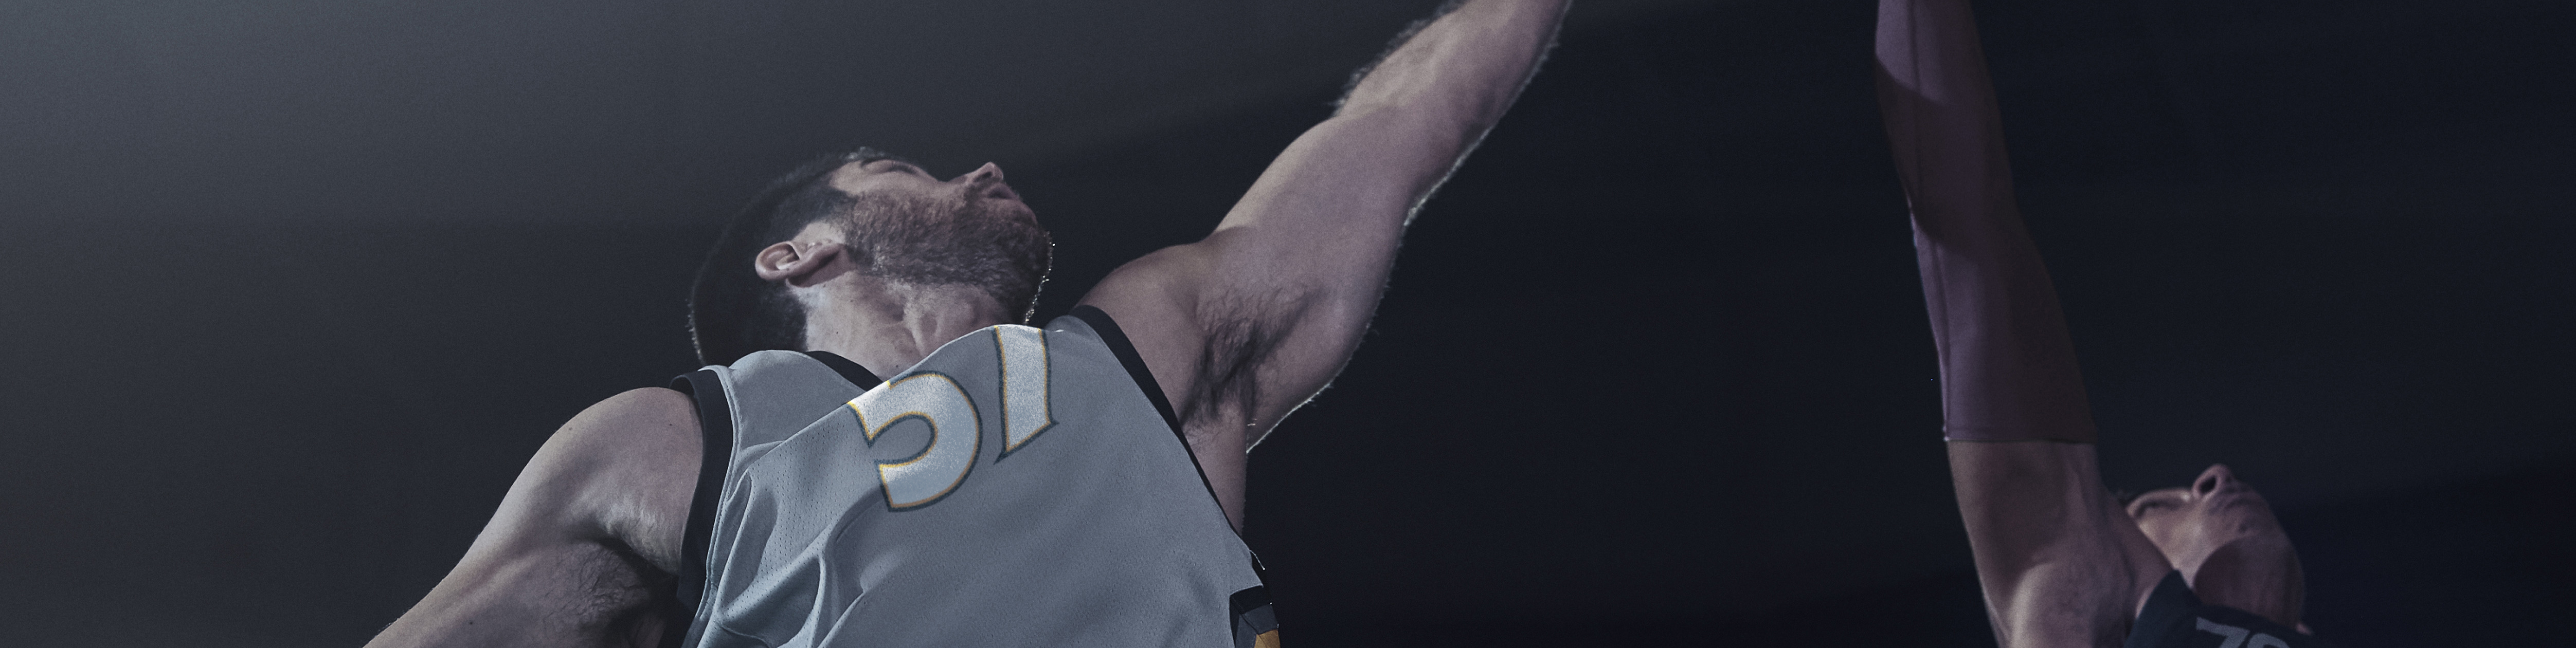 Raptors-Warriors, finale inedita: decideranno le difese?